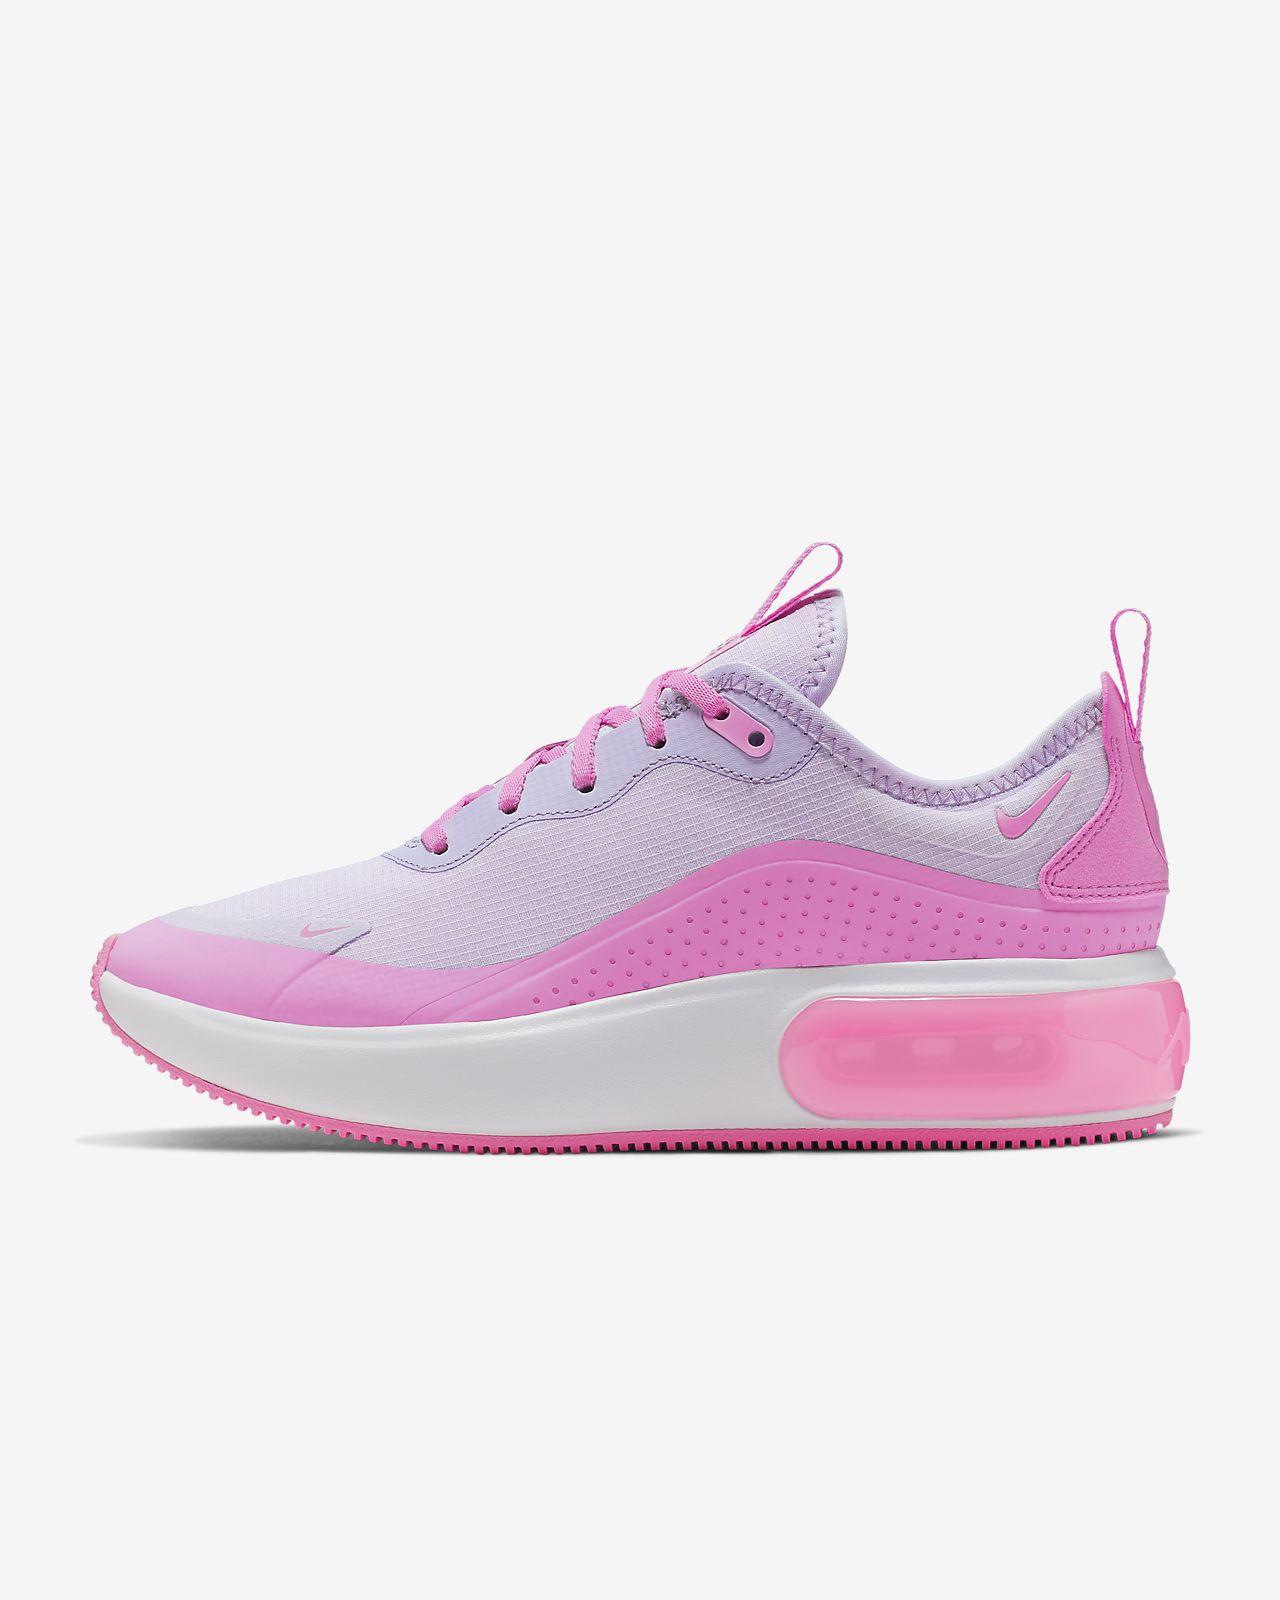 Dia Air Max Max Nike Shoe Nike Shoe Air Nike Dia N0vOmnw8